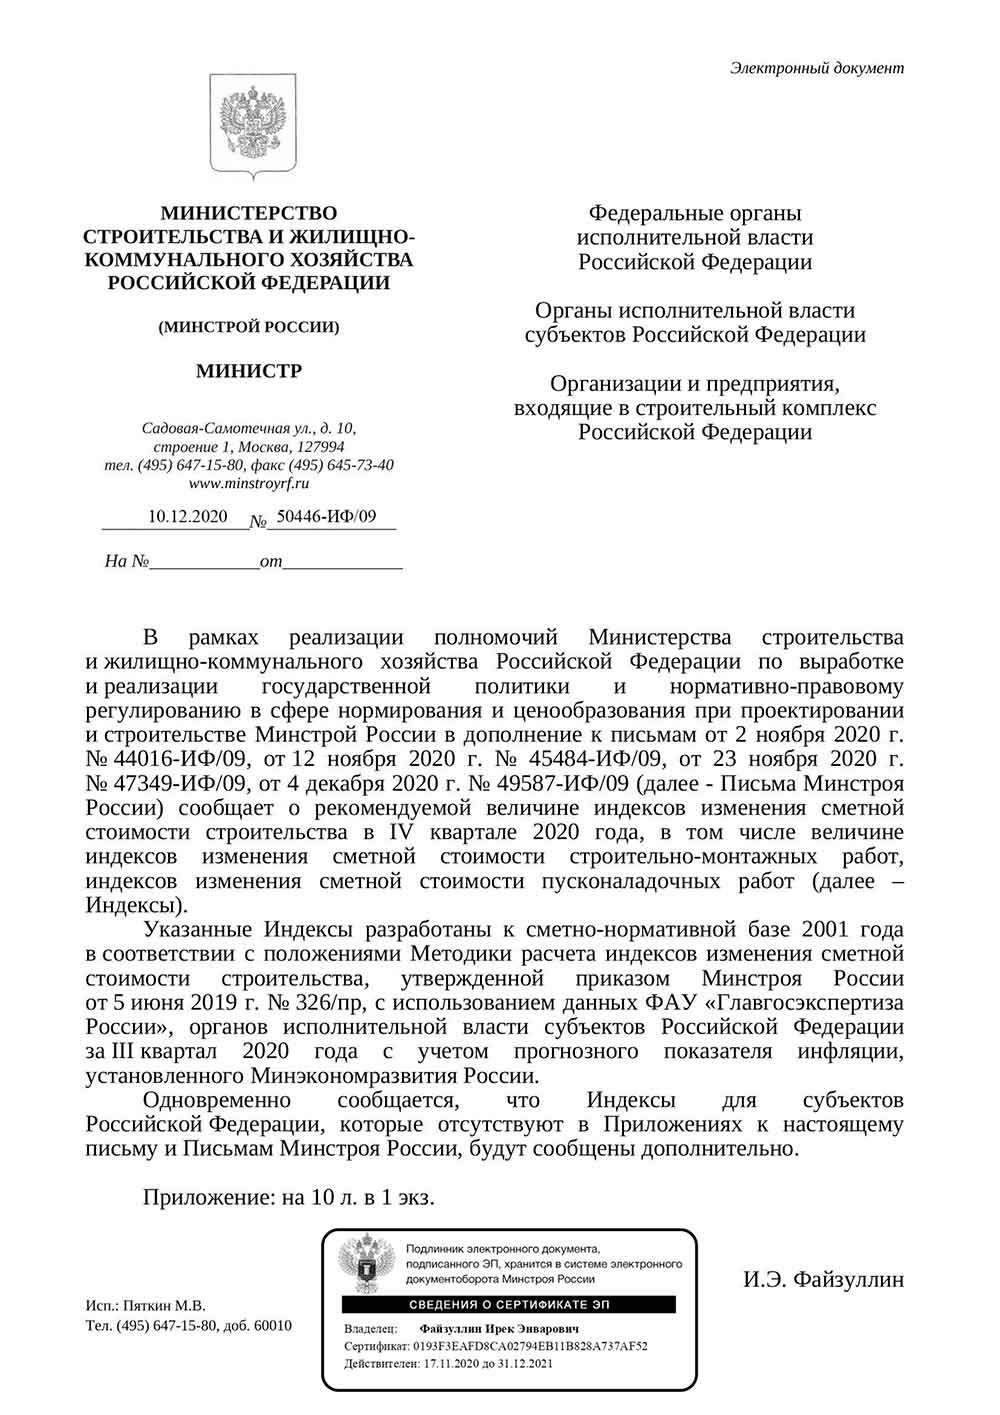 Письмо Минстроя РФ №50446-ИФ/09 от 10.12.2020 г.